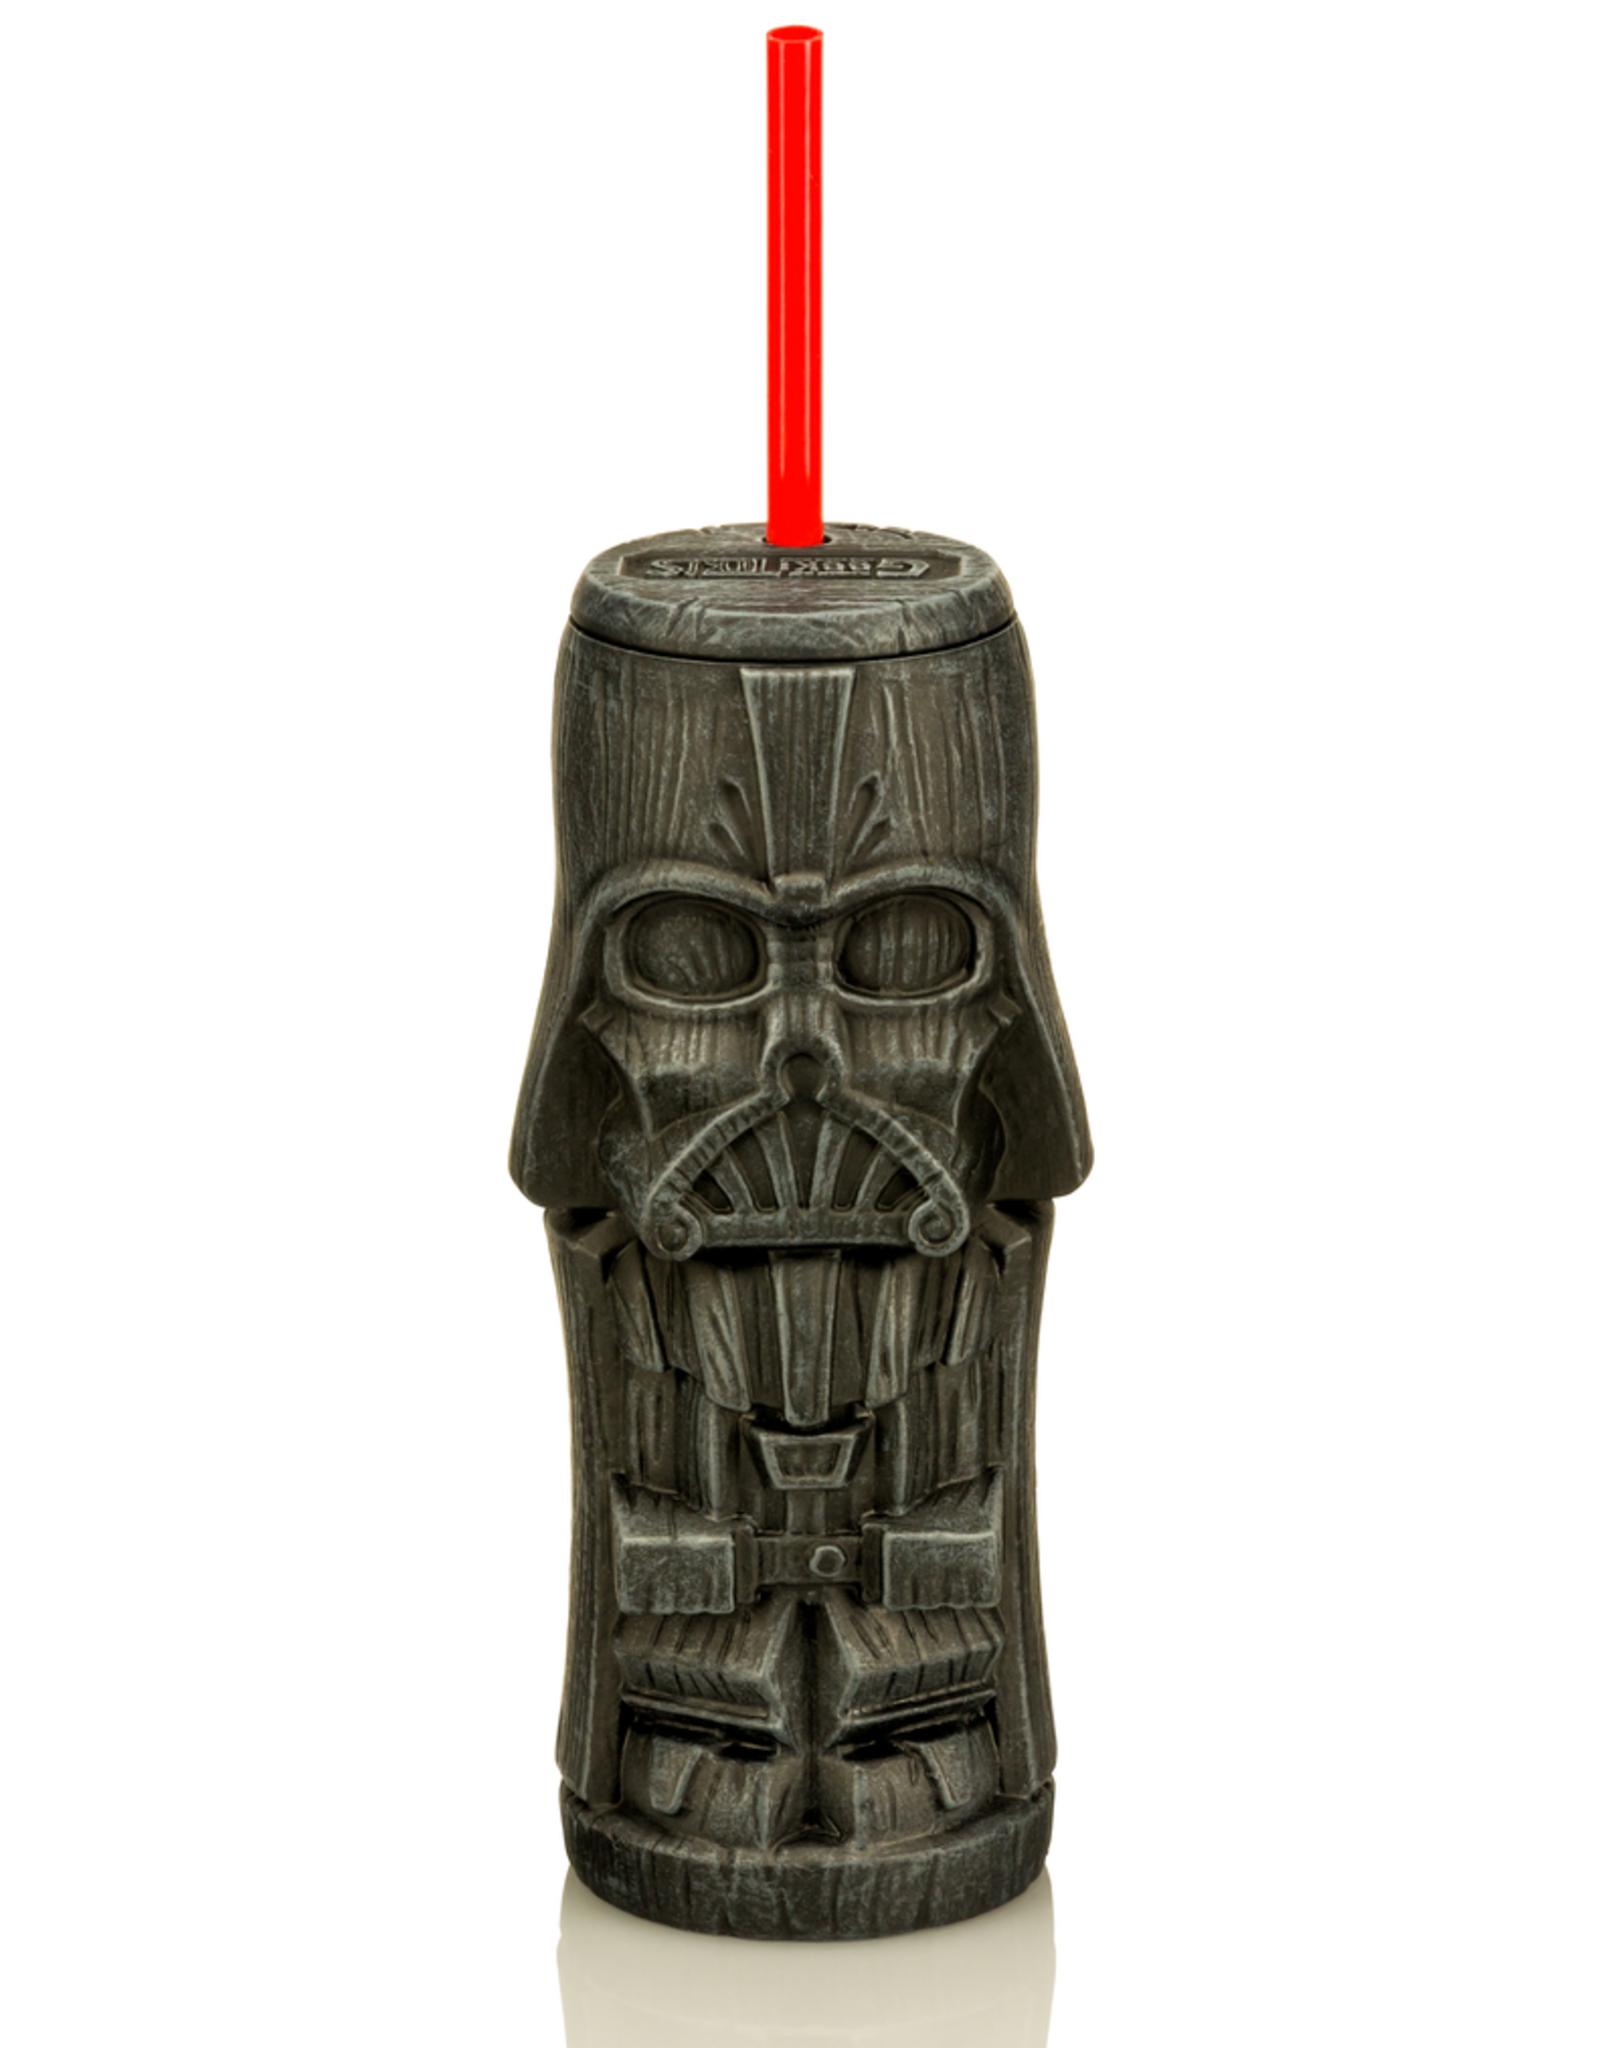 Geeki Tikis - Darth Vader Plastic Tumbler